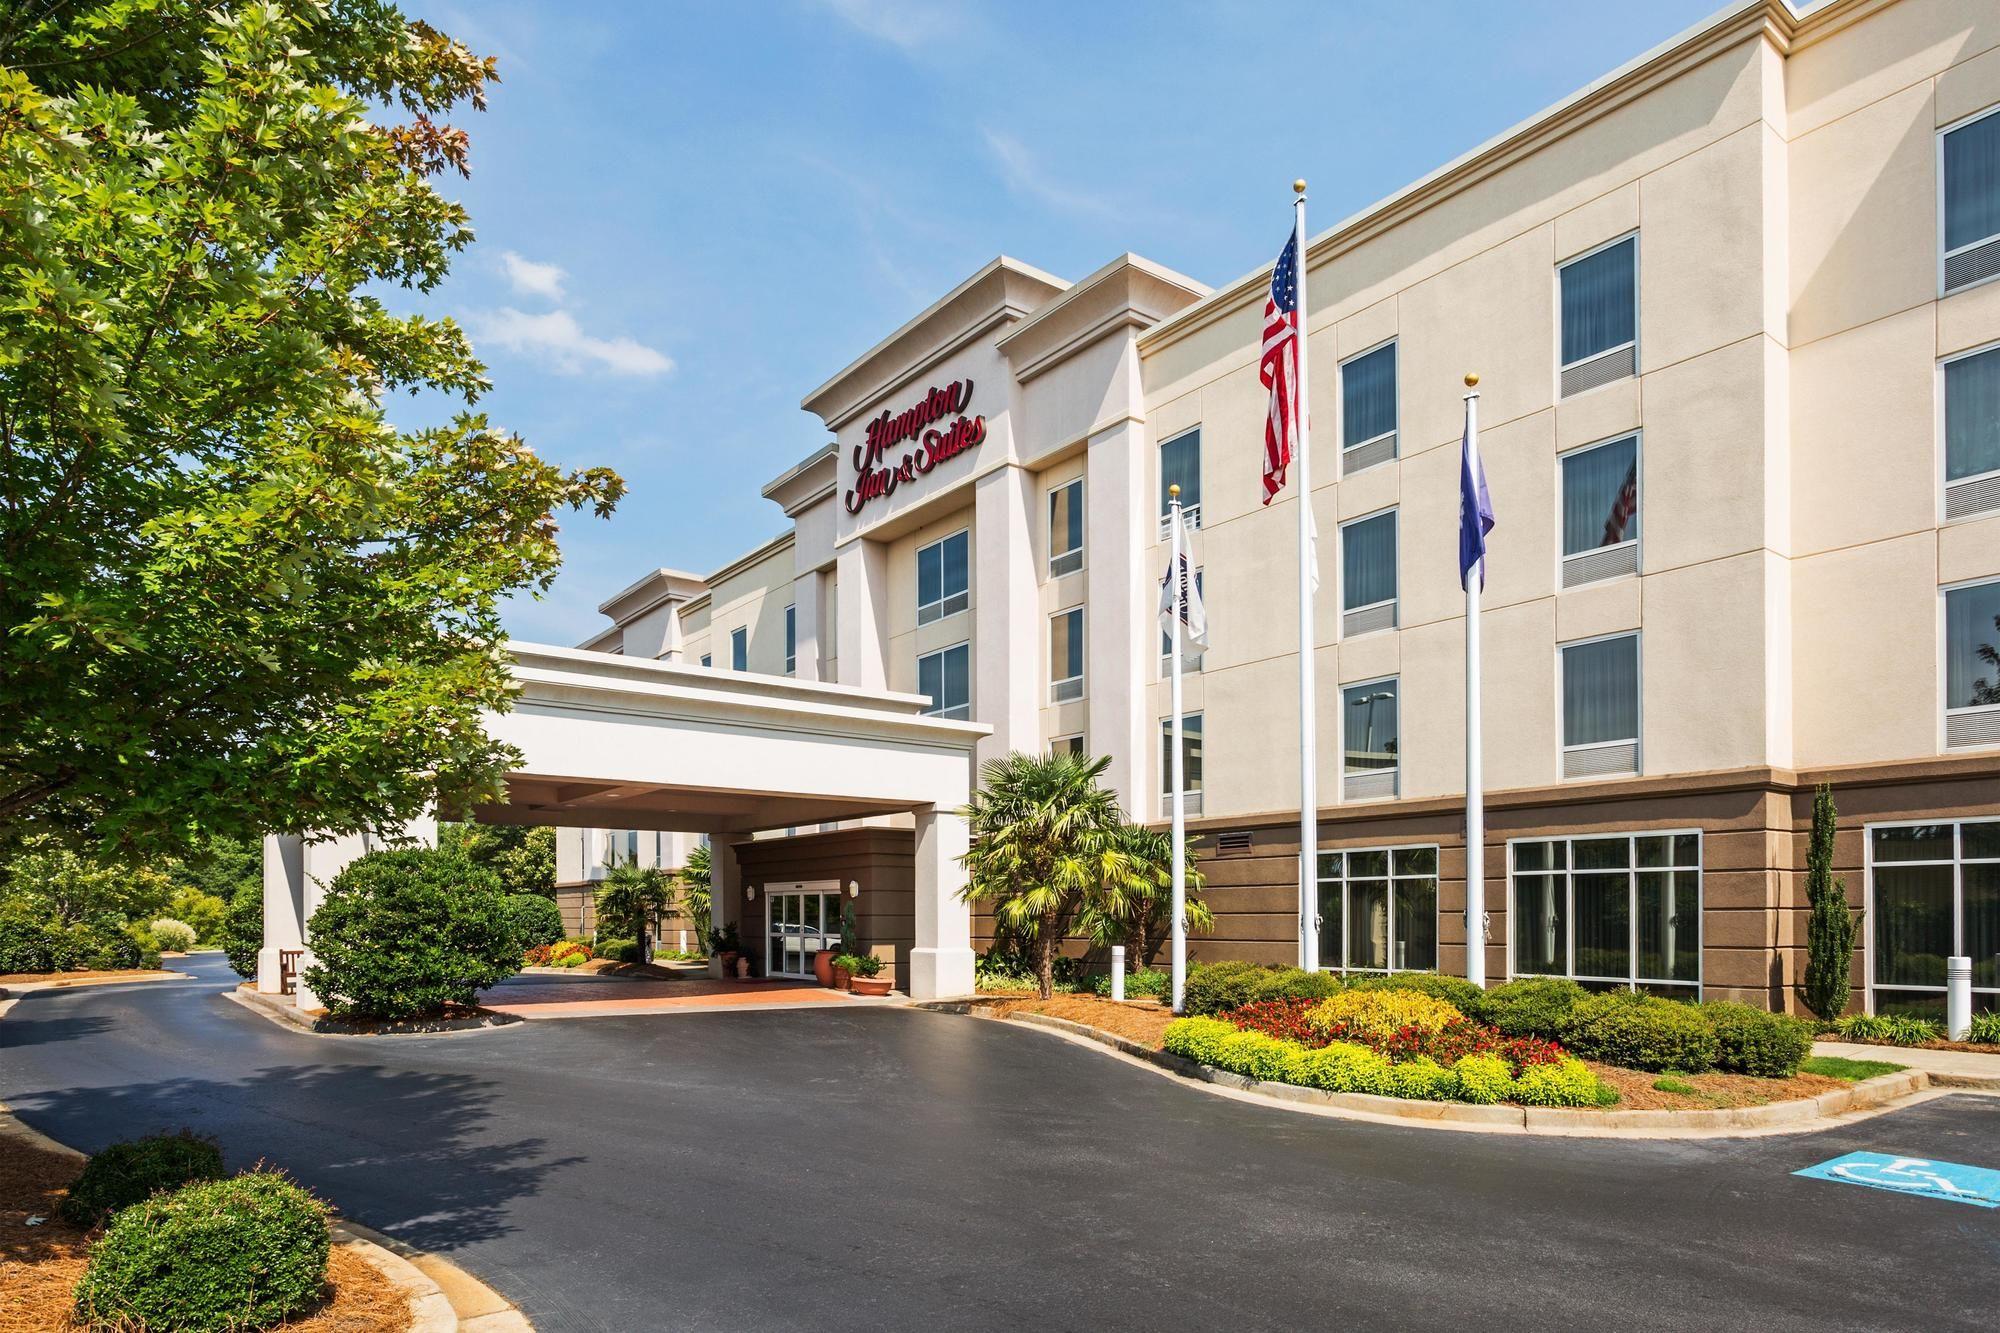 Hampton Inn & Suites Clinton - I-26 in Clinton, SC